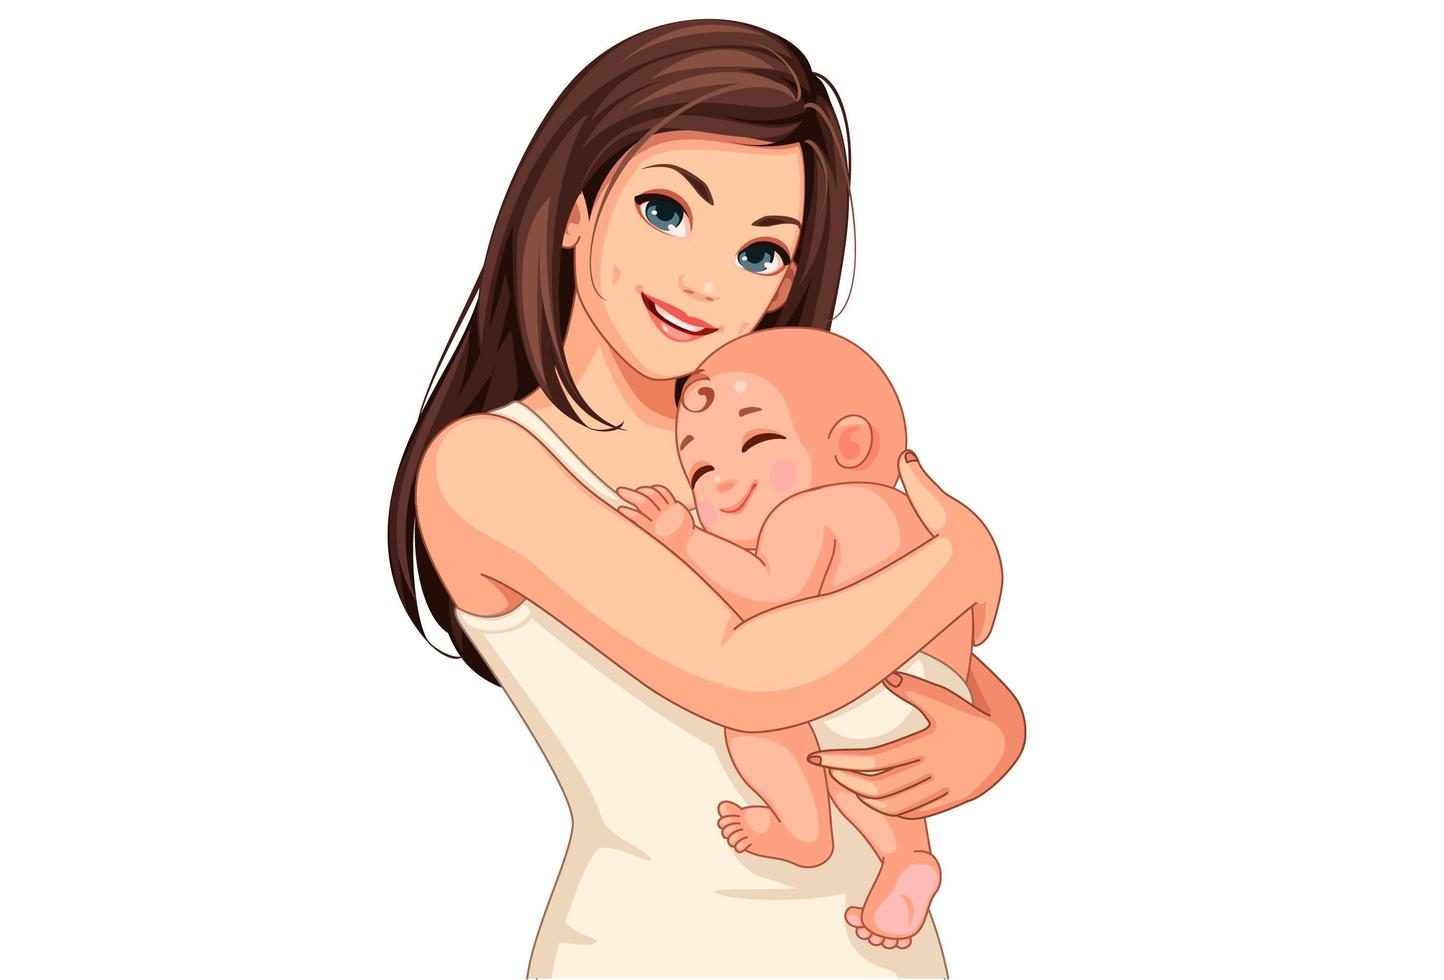 jovem mãe feliz segurando um bebê vetor